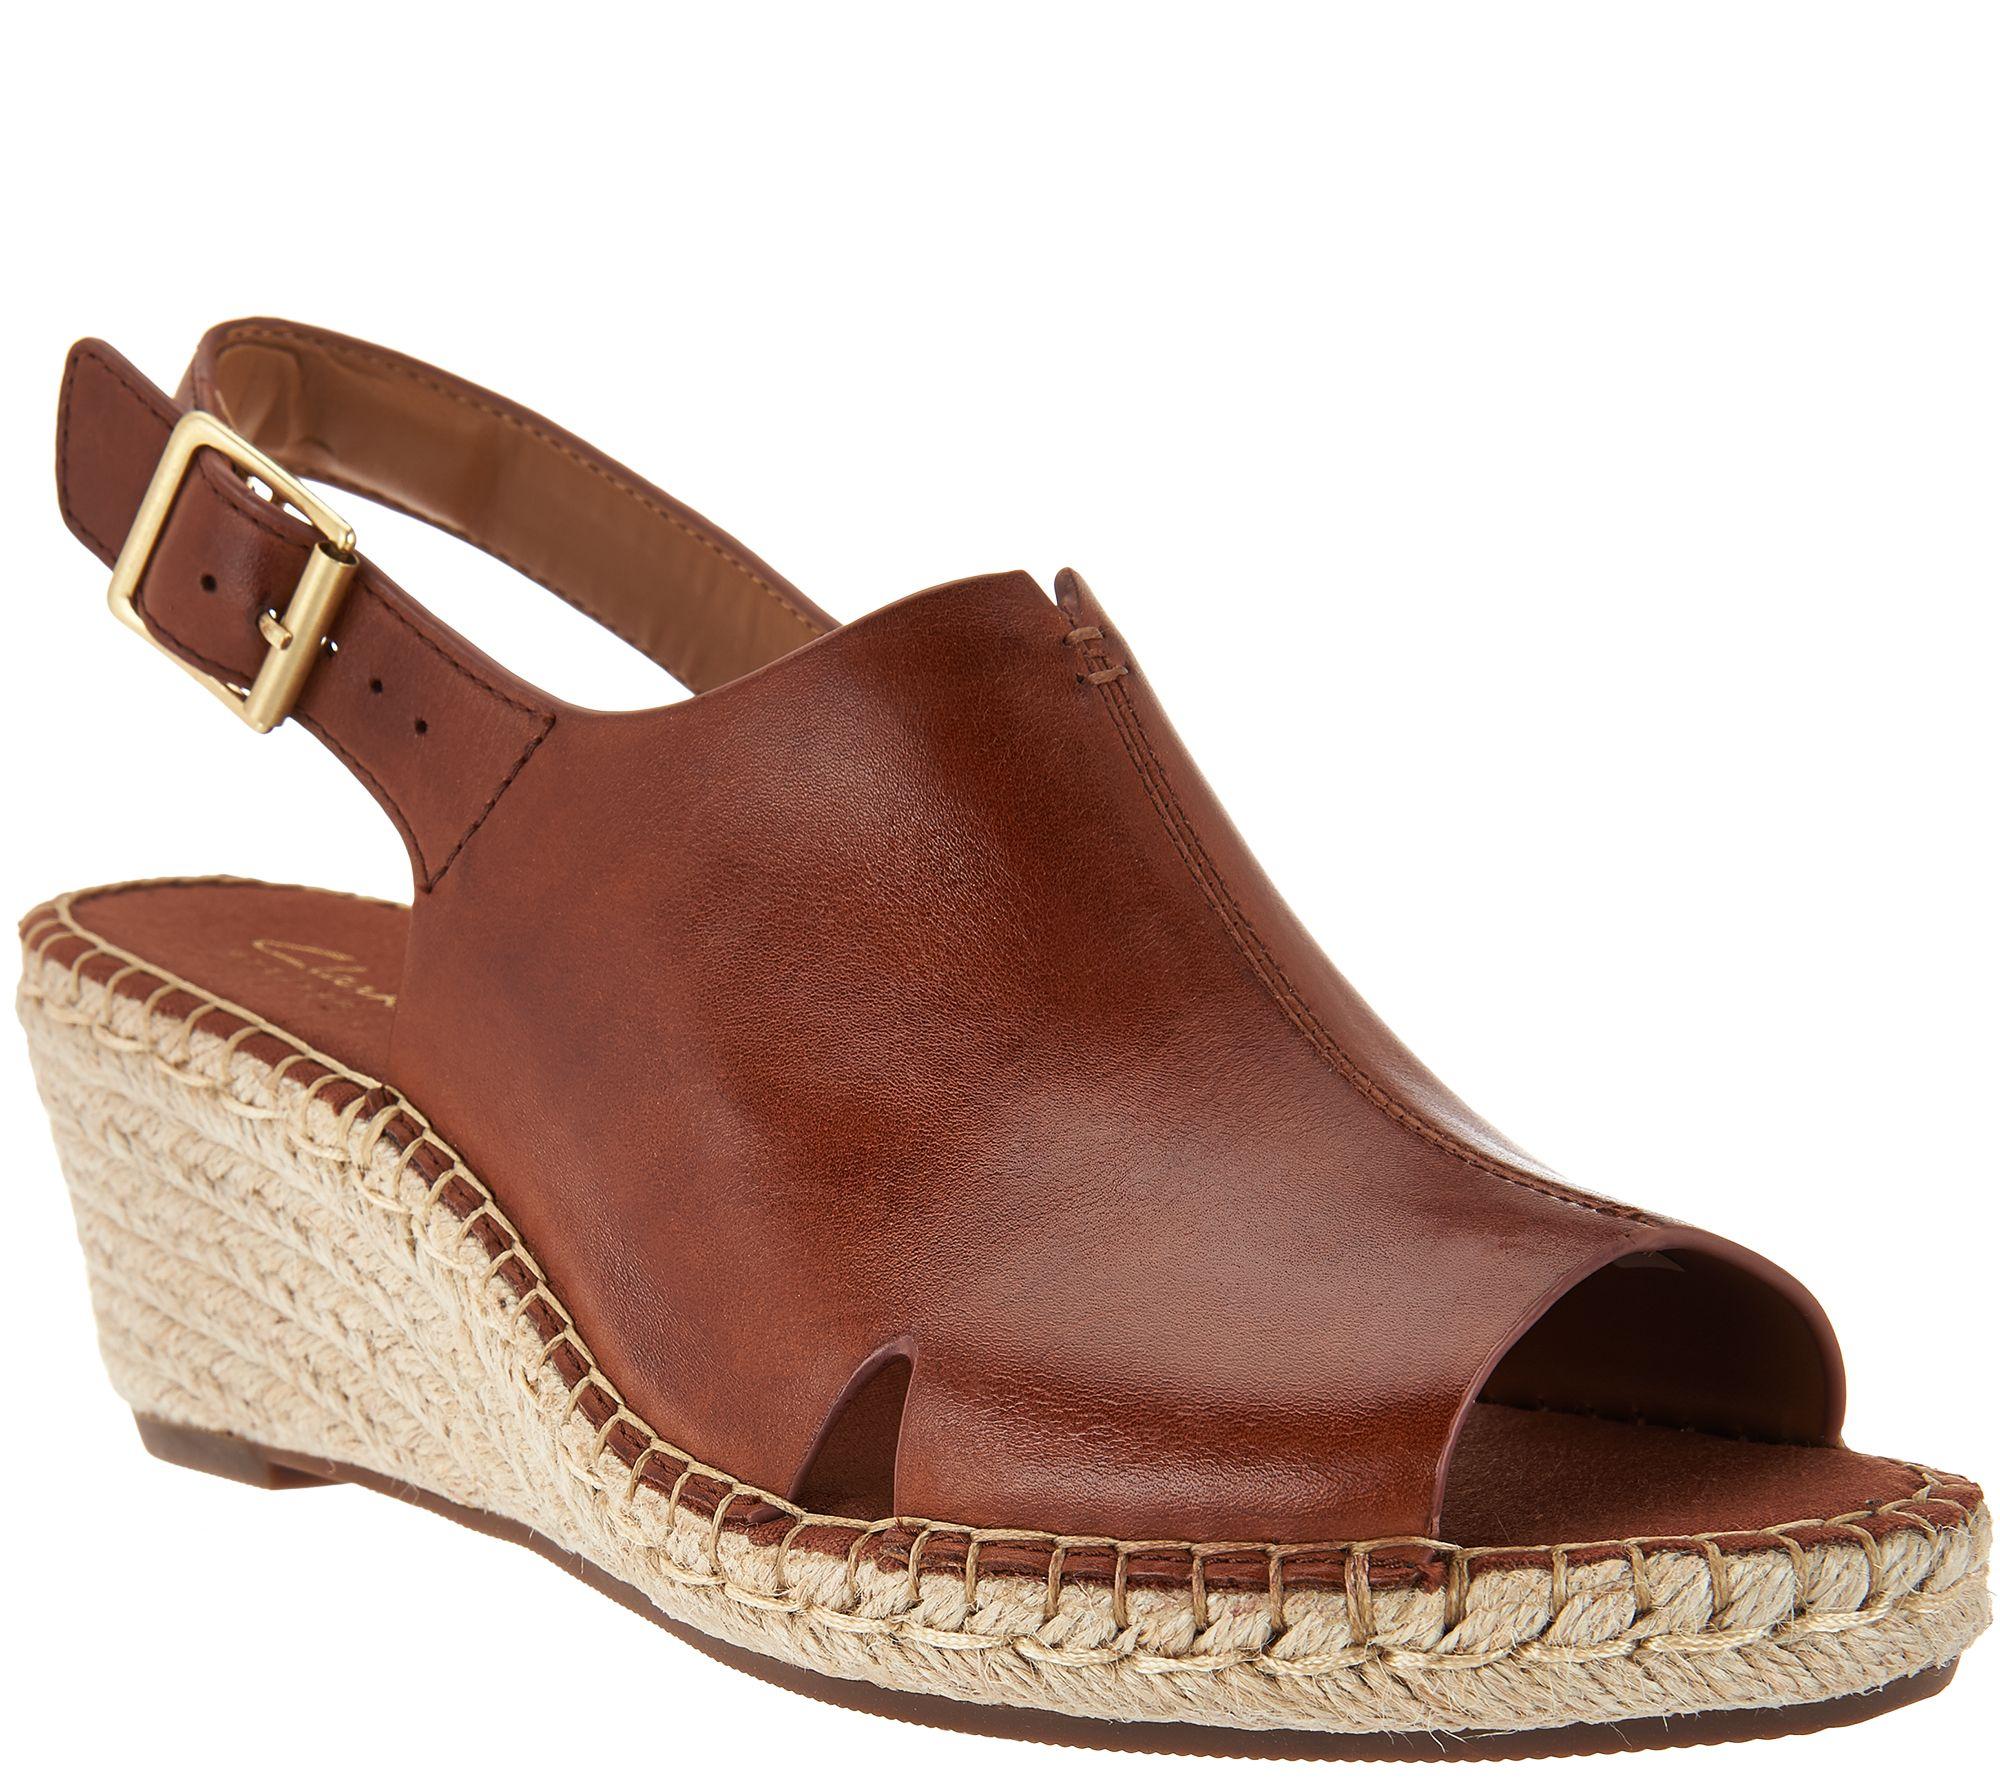 18d8e1c0915db8 Clarks Artisan Leather Espadrille Wedge Sandals - Petrina Meera - Page 1 —  QVC.com